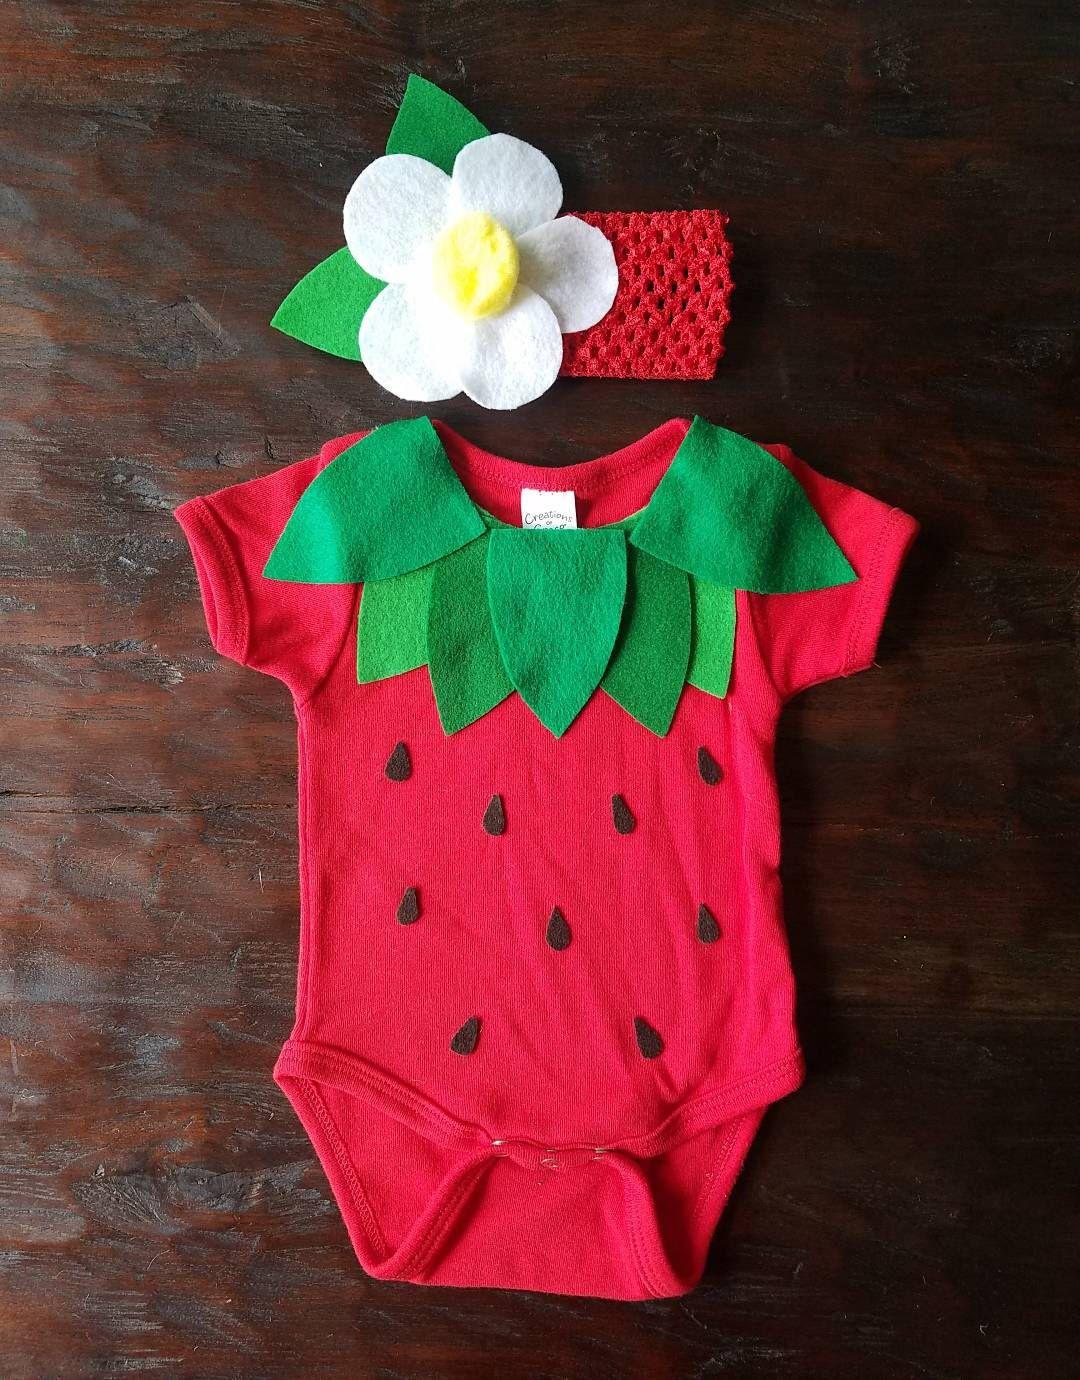 Infant / Baby Strawberry Onesie Costume with headband